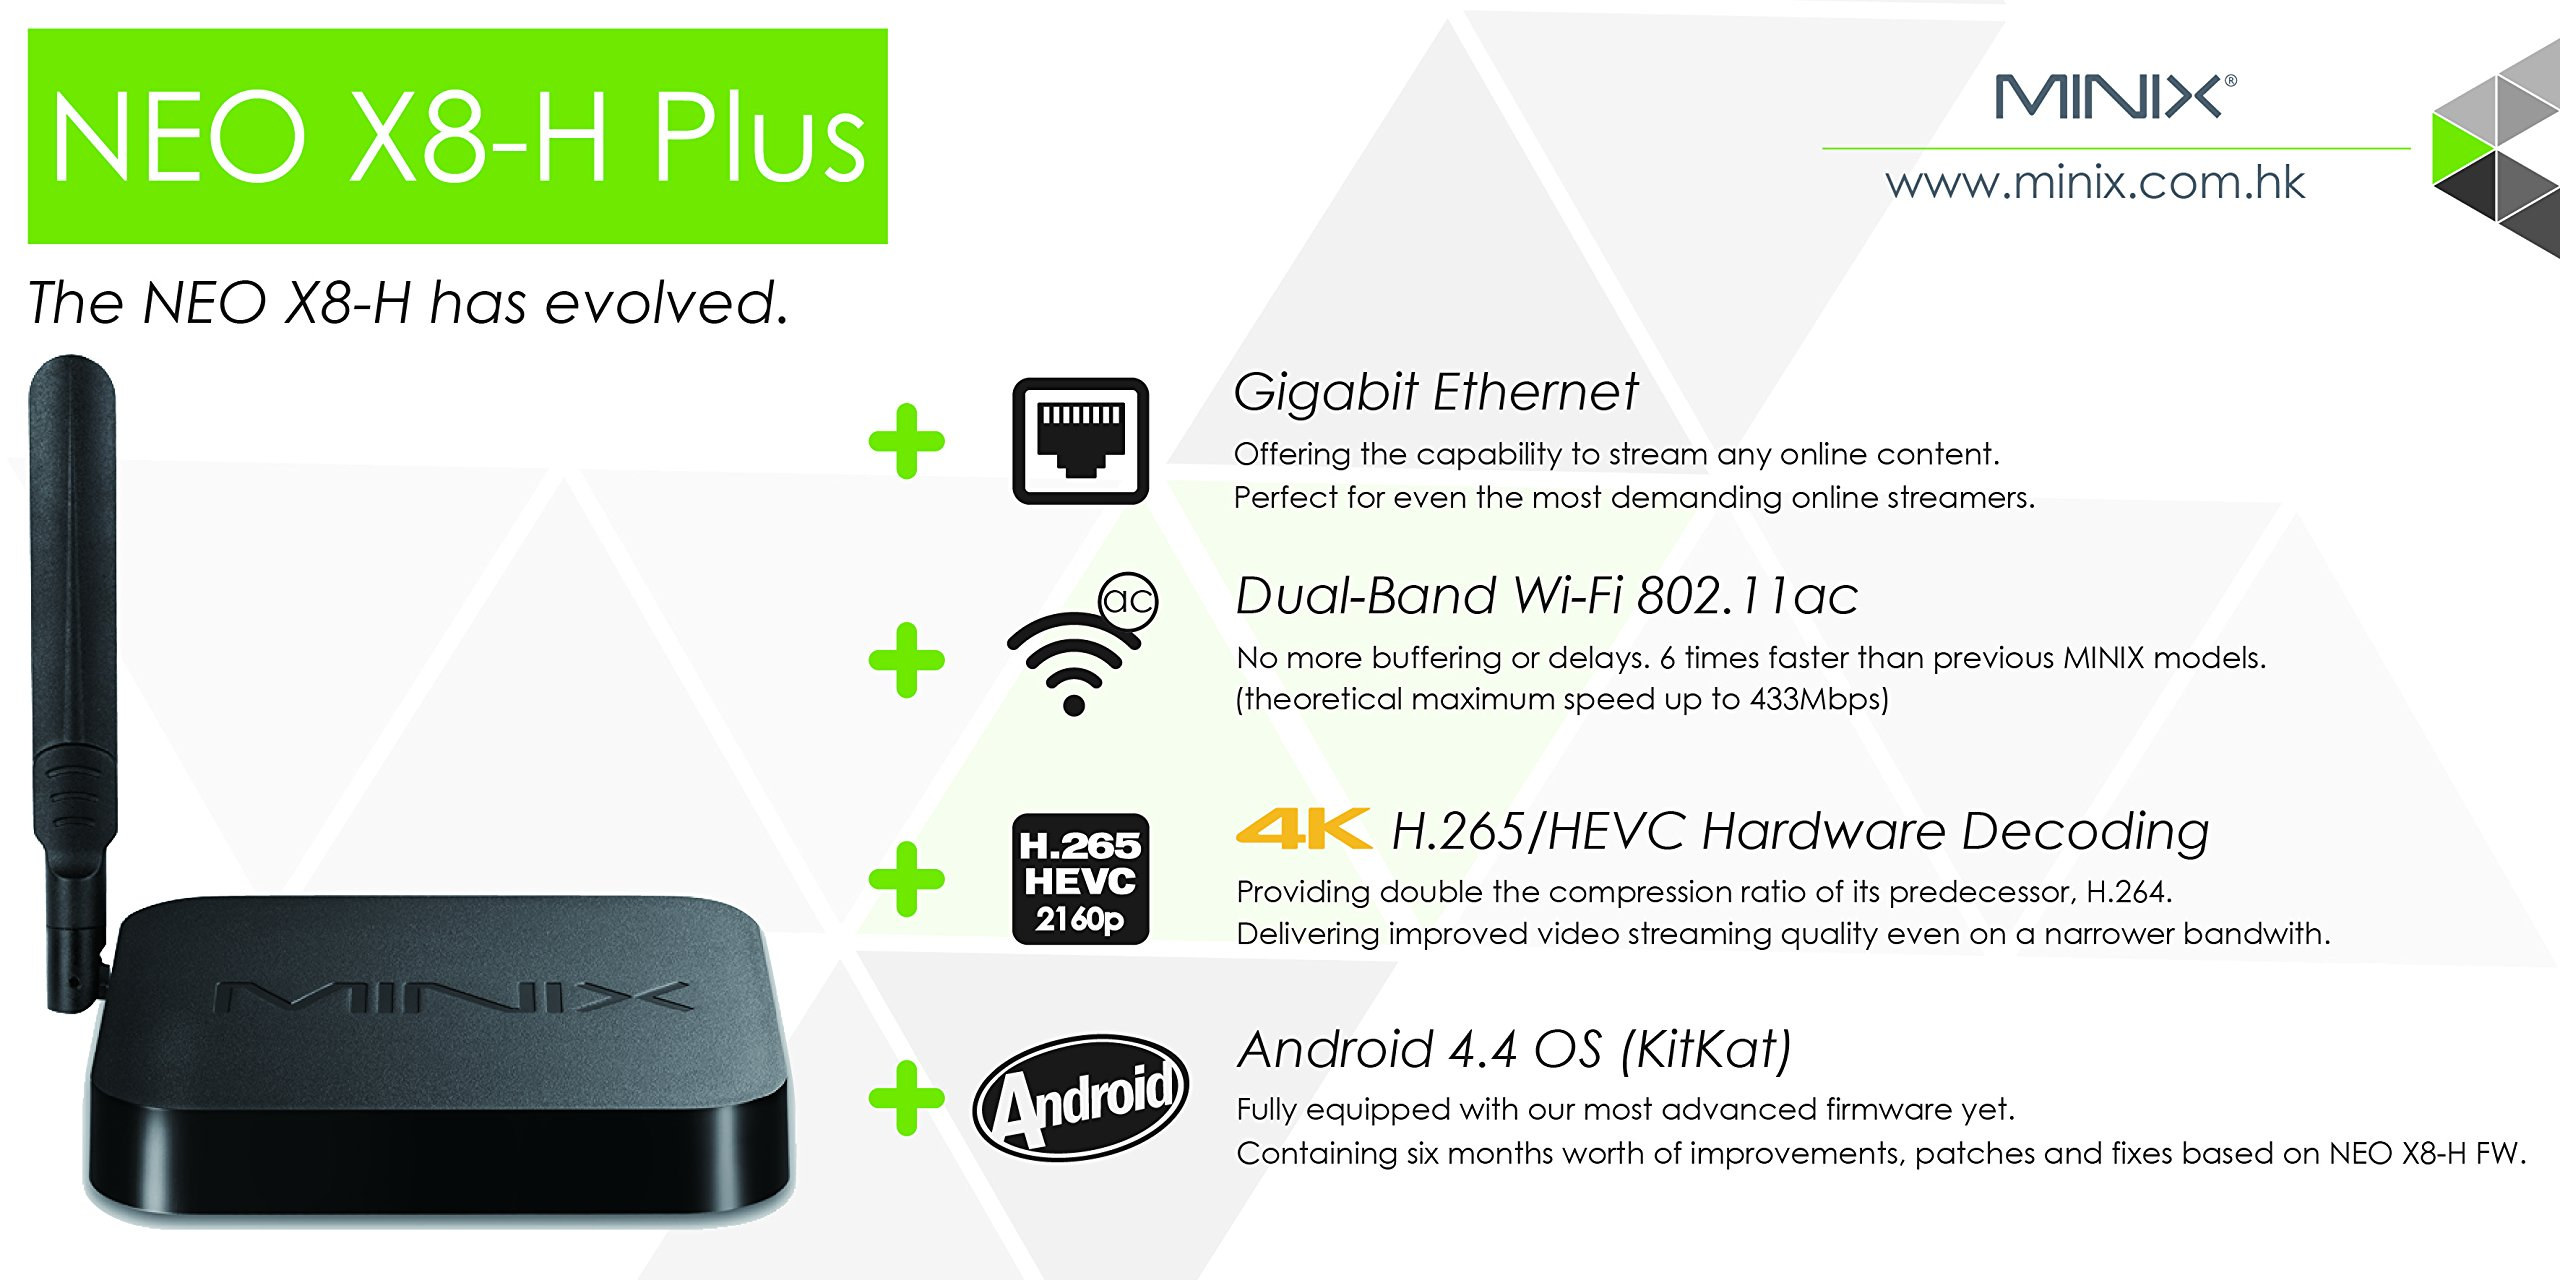 MINIX X8-H Plus Smart TV Box Mini PC & Media Streaming Player Amlogic S812-H Quad-Core Cortex-A9 Processor up to 2.0GHz Android 4.4.2 Full 2160p H.265/HEVC HDMI 2G/16G Hardware Recording by Jesurun (Image #4)